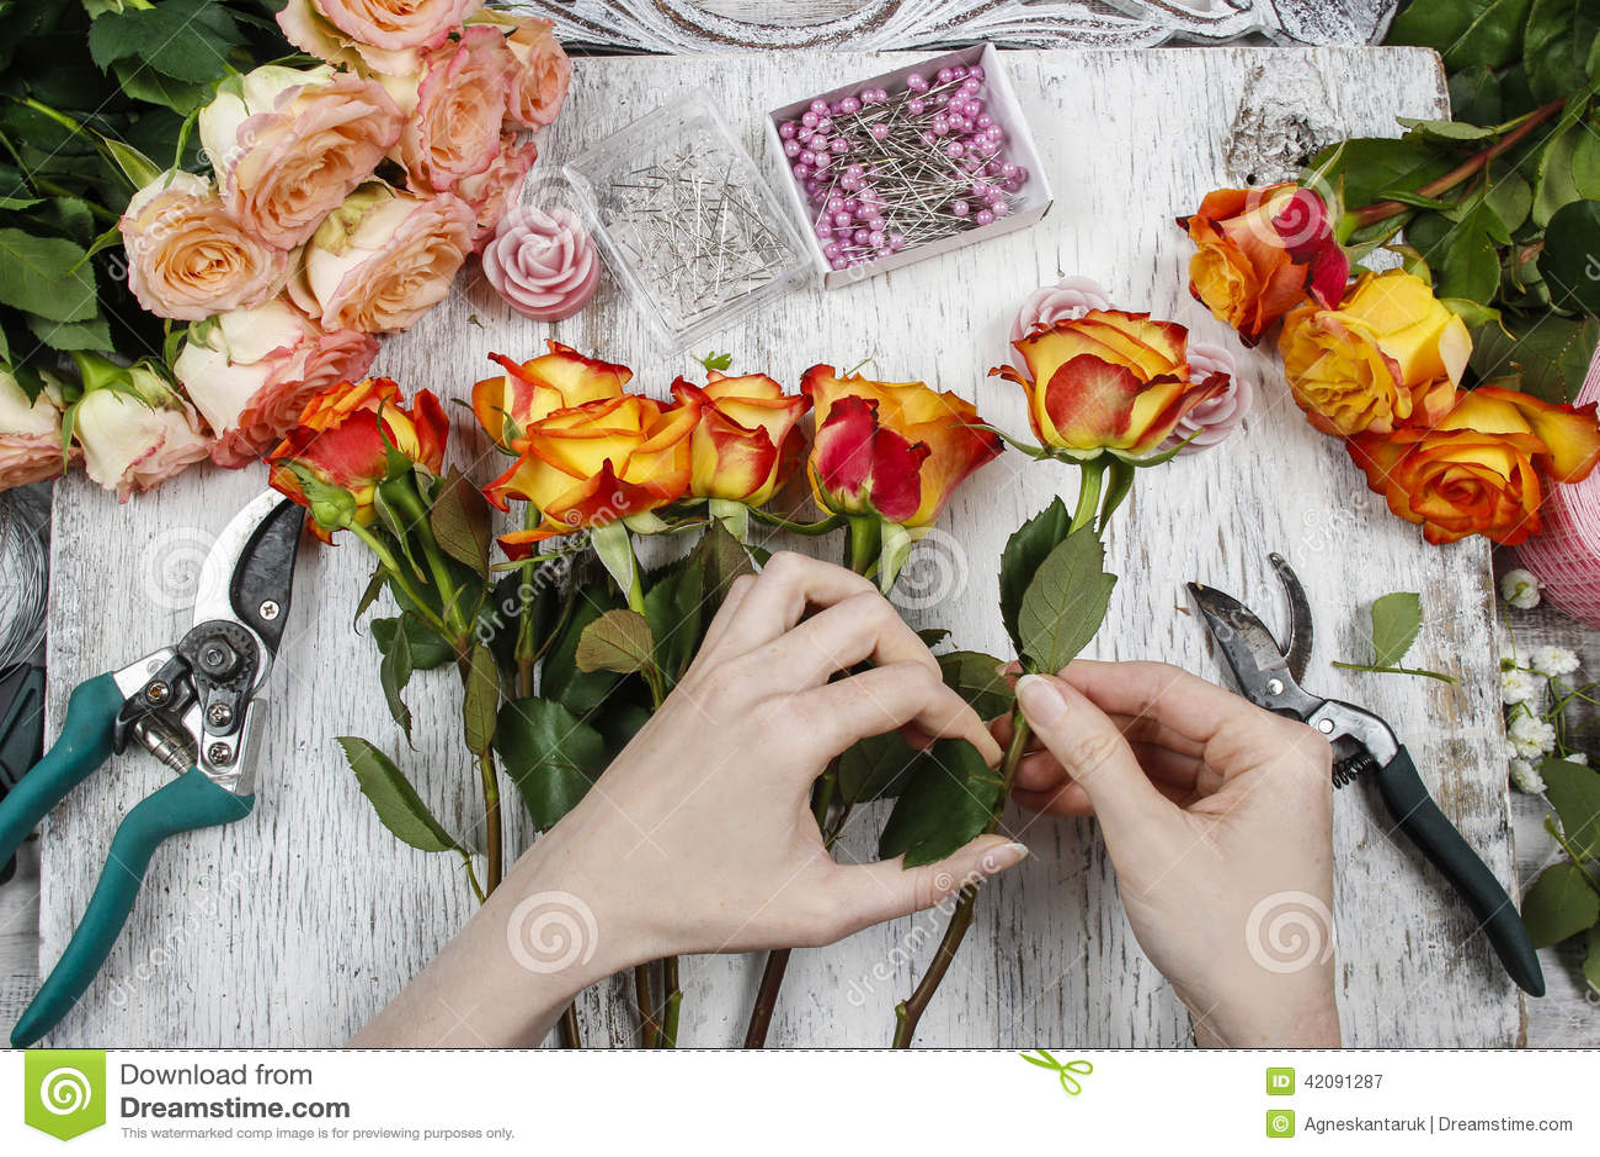 Florist at work. Woman making wedding bouquet of orange roses